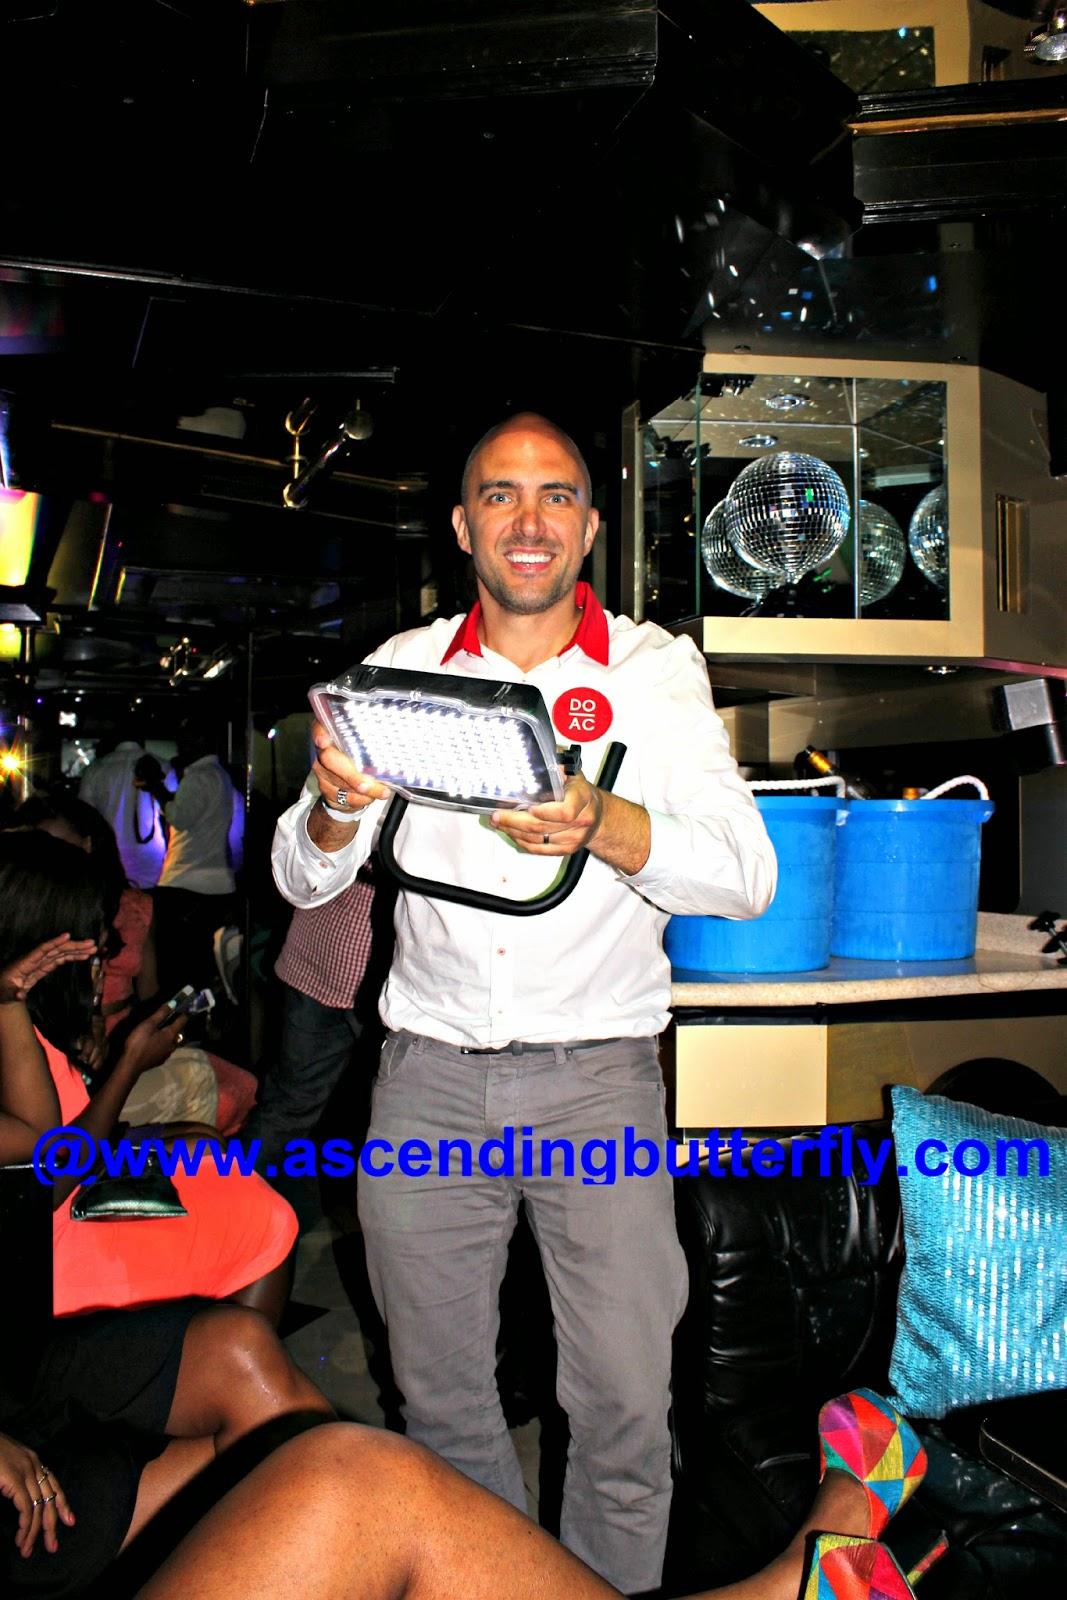 DJ Nigel Richards, #DOACNightlife Bus, Party Bus, Atlantic City, Visit AC, Atlantic City Alliance, DO AC, DO AC Nightlife